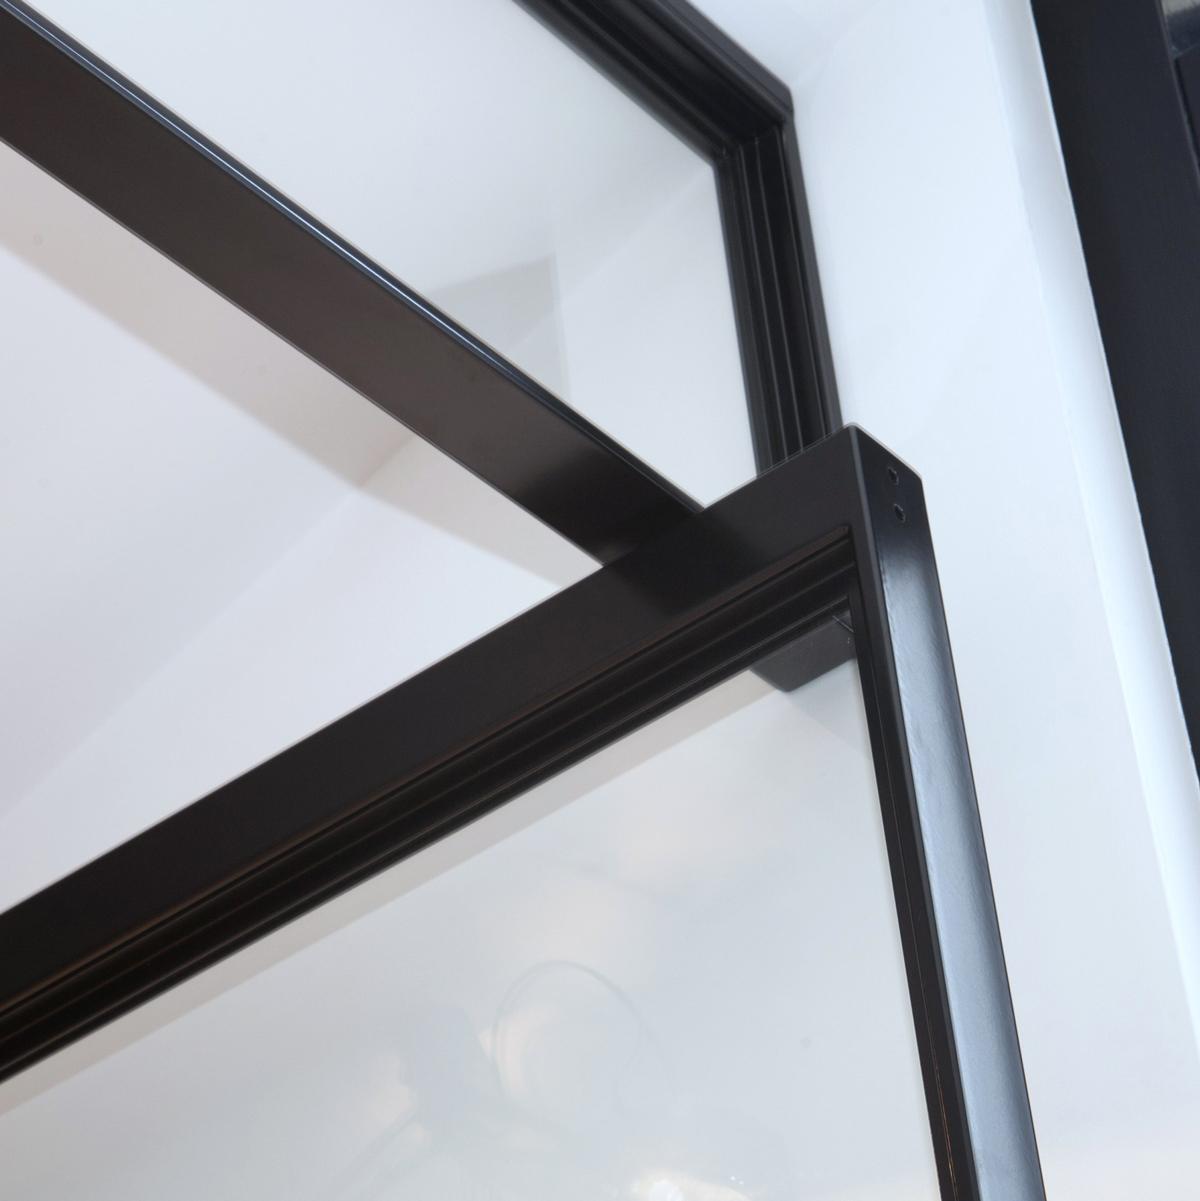 REV_Stalen-Design-Taatsdeuren-Numansdorp-4-e1437725862577.jpg